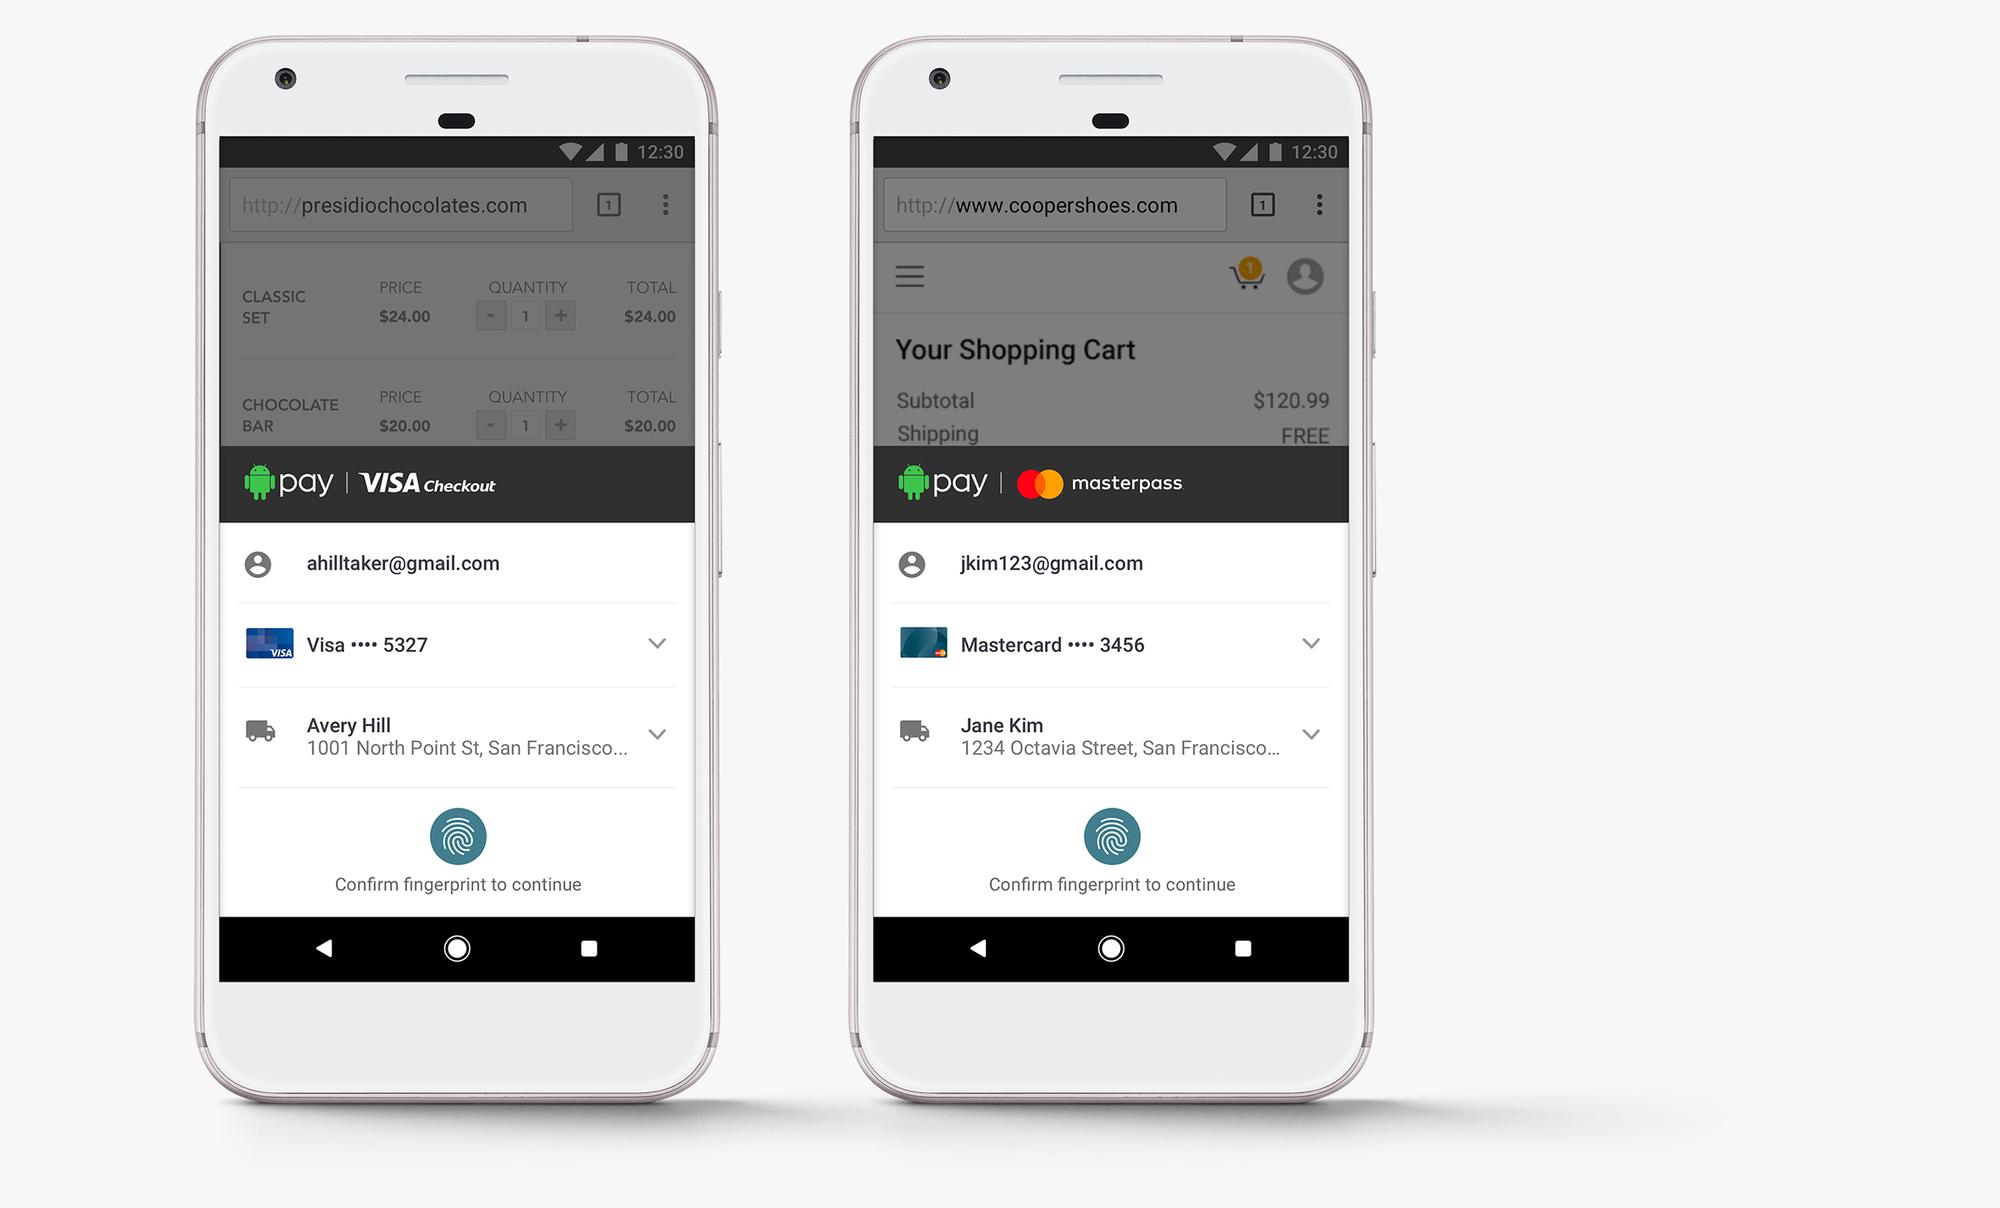 android pay - visa checkout mobile app - Pakistani Google